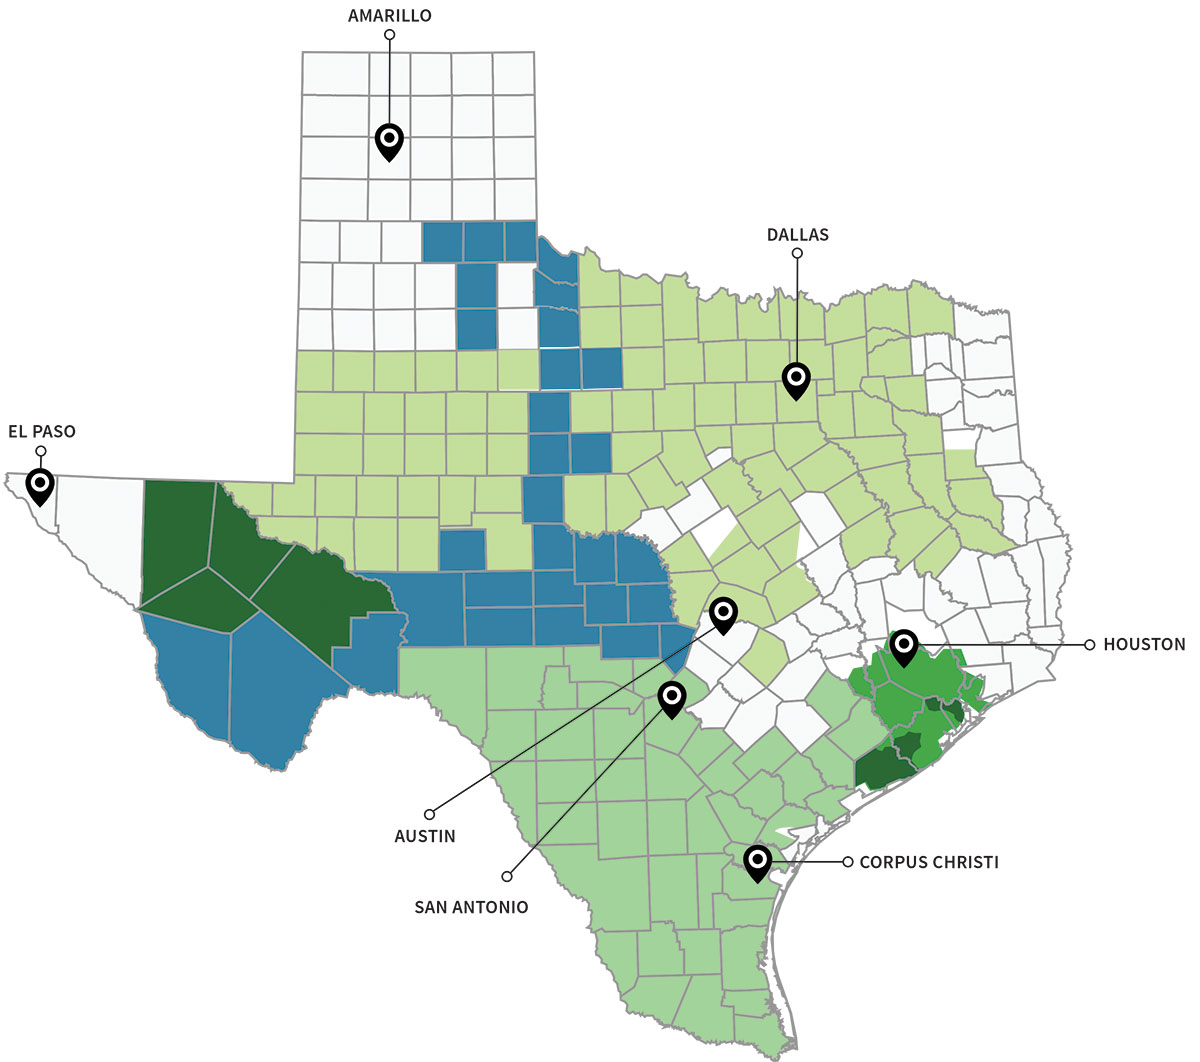 Texas Energy Deregulation Map | Electricity Deregulated Cities In Texas - Texas Utility Map